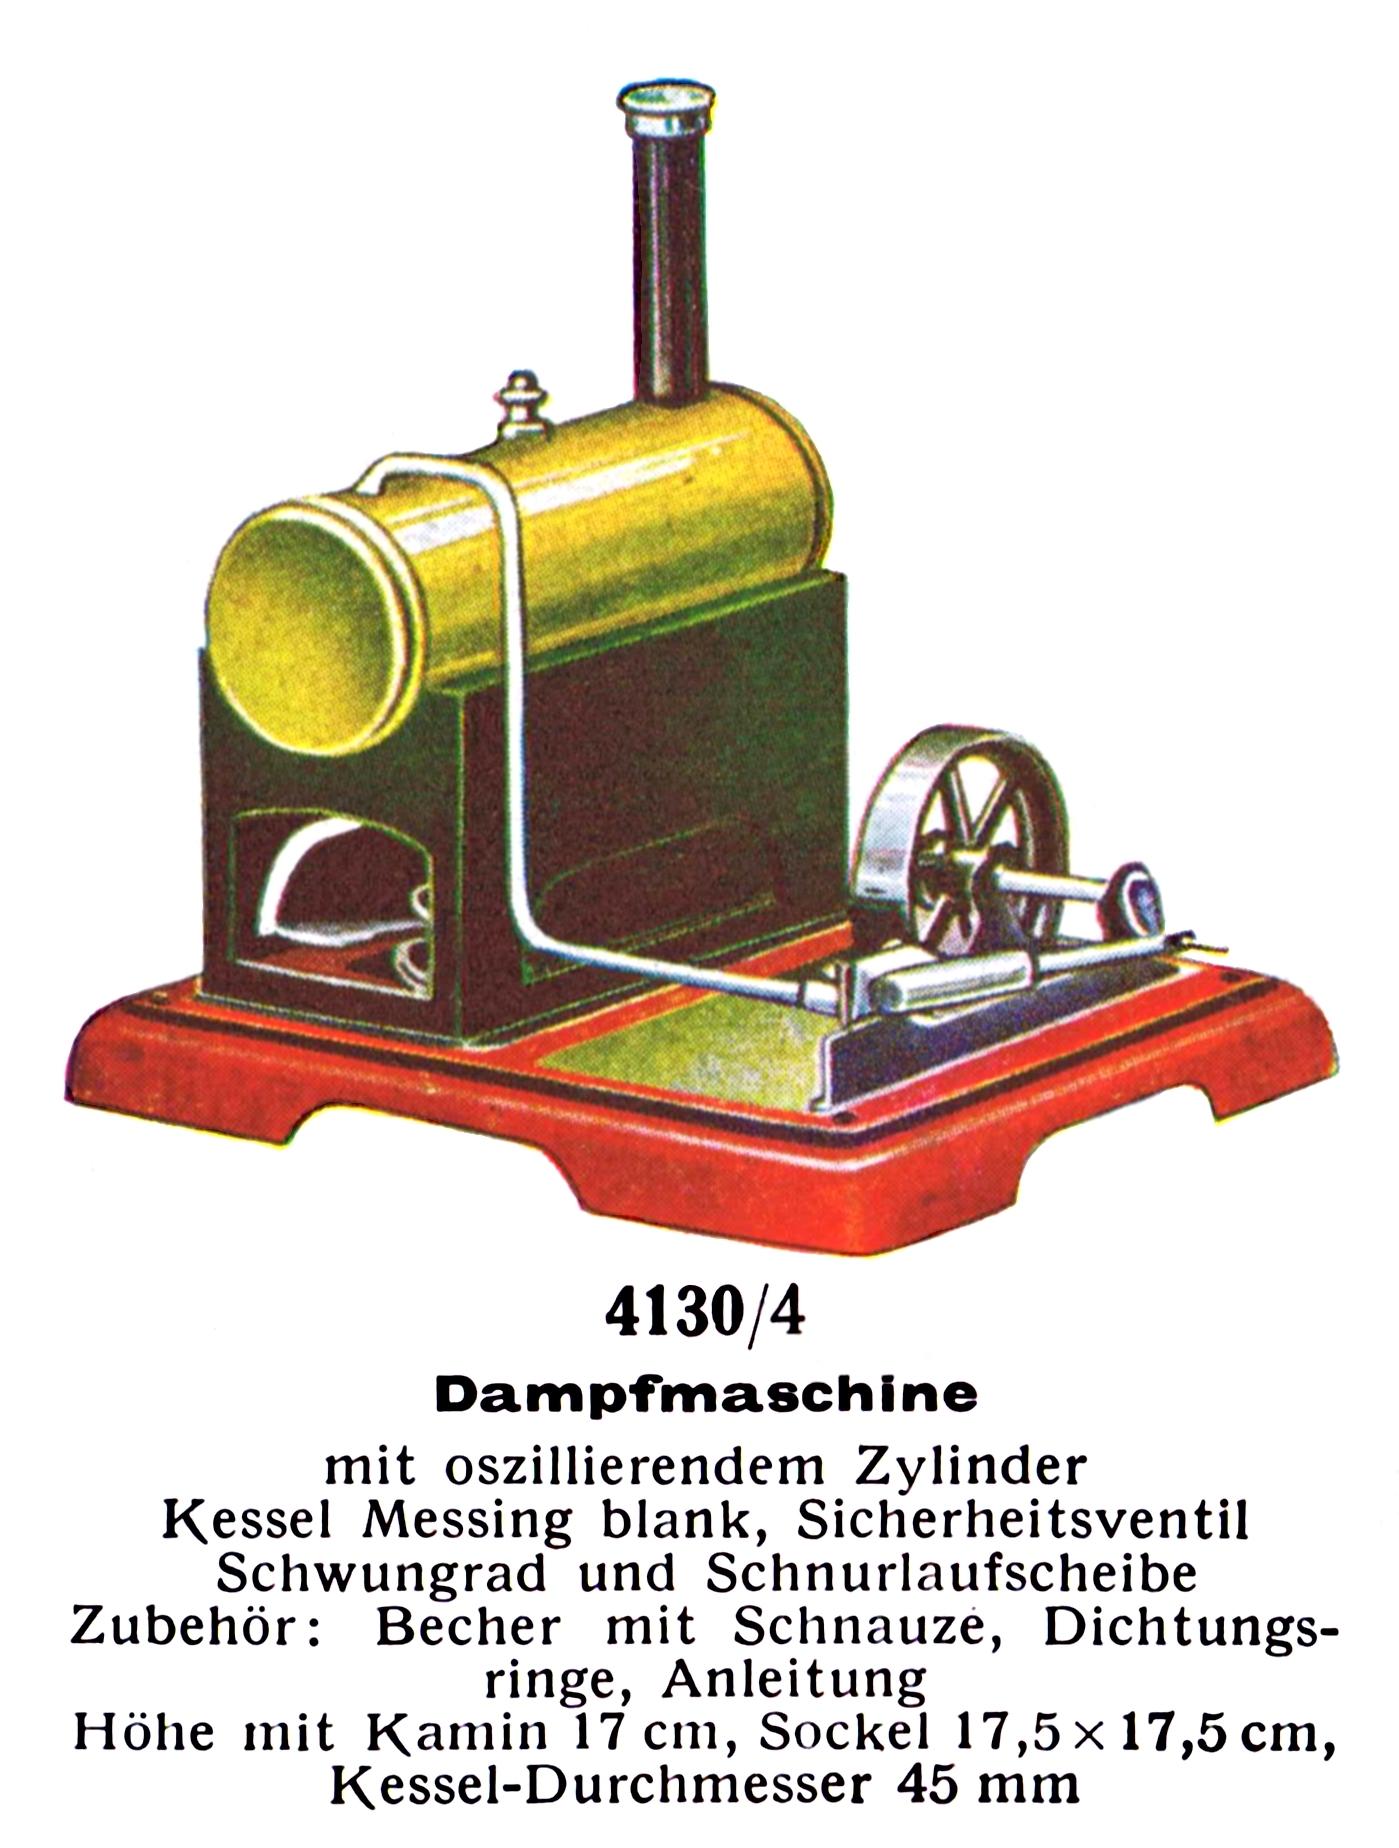 Category:Märklin Steam - The Brighton Toy and Model Index